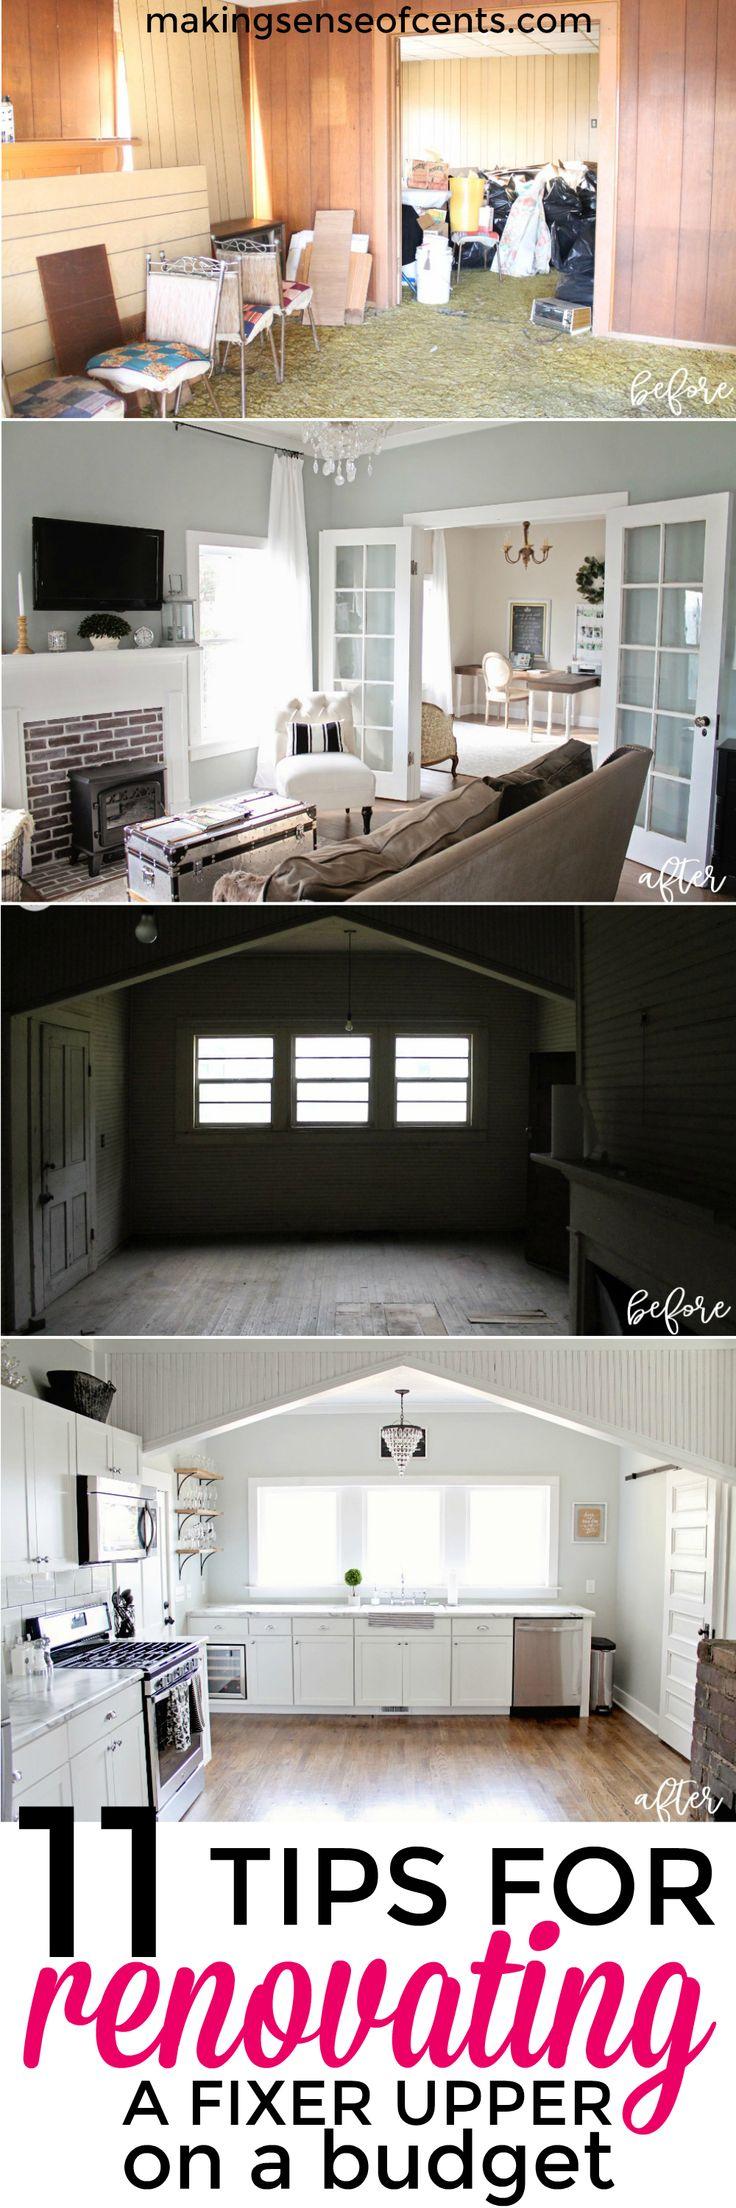 saving money when renovating a fixer upper fixer upper homes - Home Renovation Designs